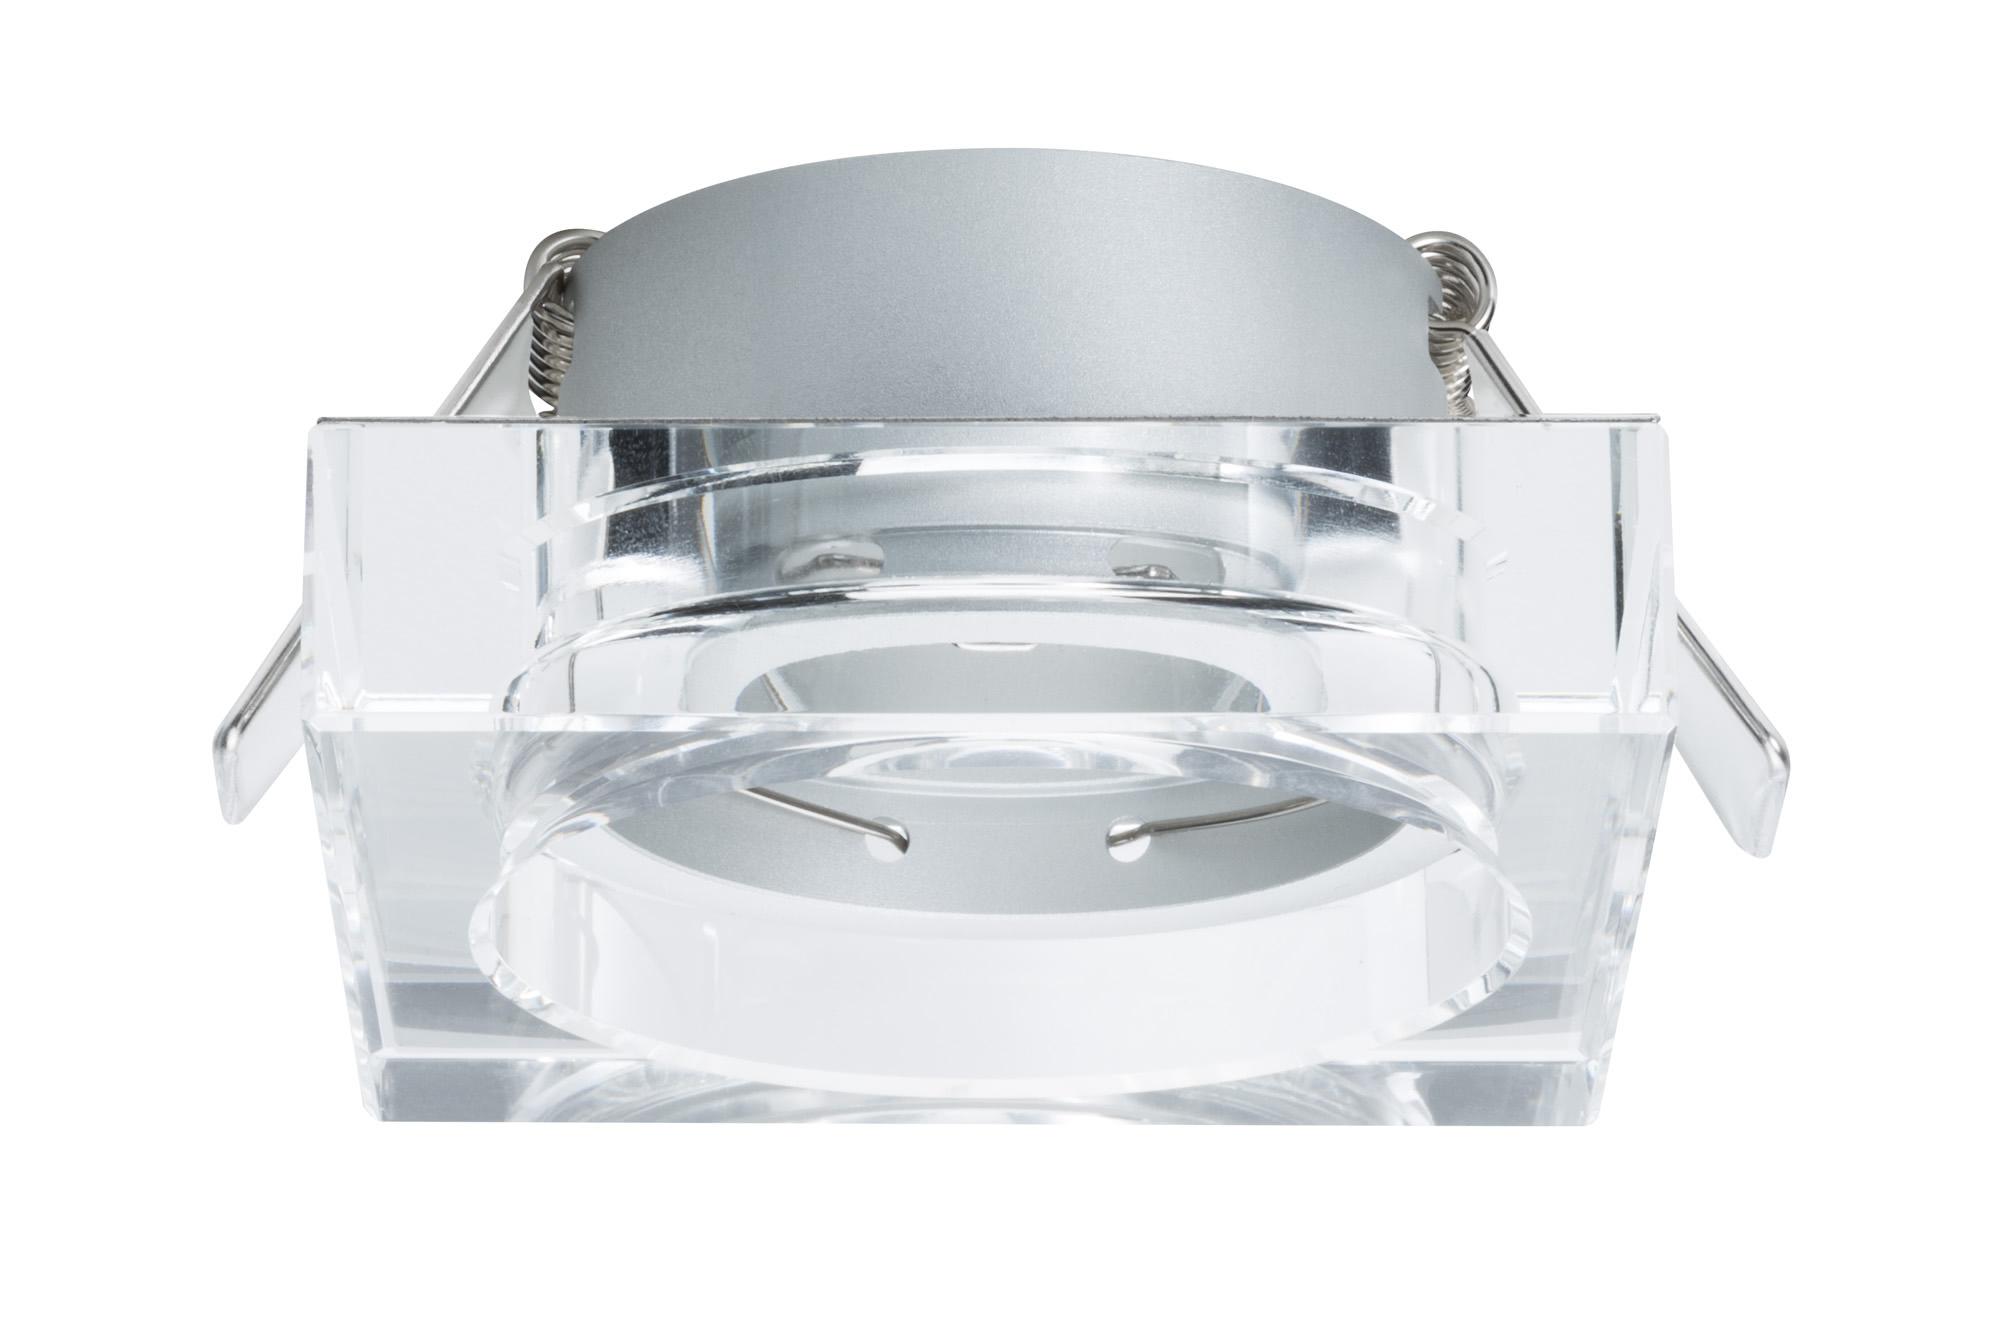 Paulmann. 92597 Комплект светильников Prem.EBL 3 шт. Spot Cristal, прозрачный